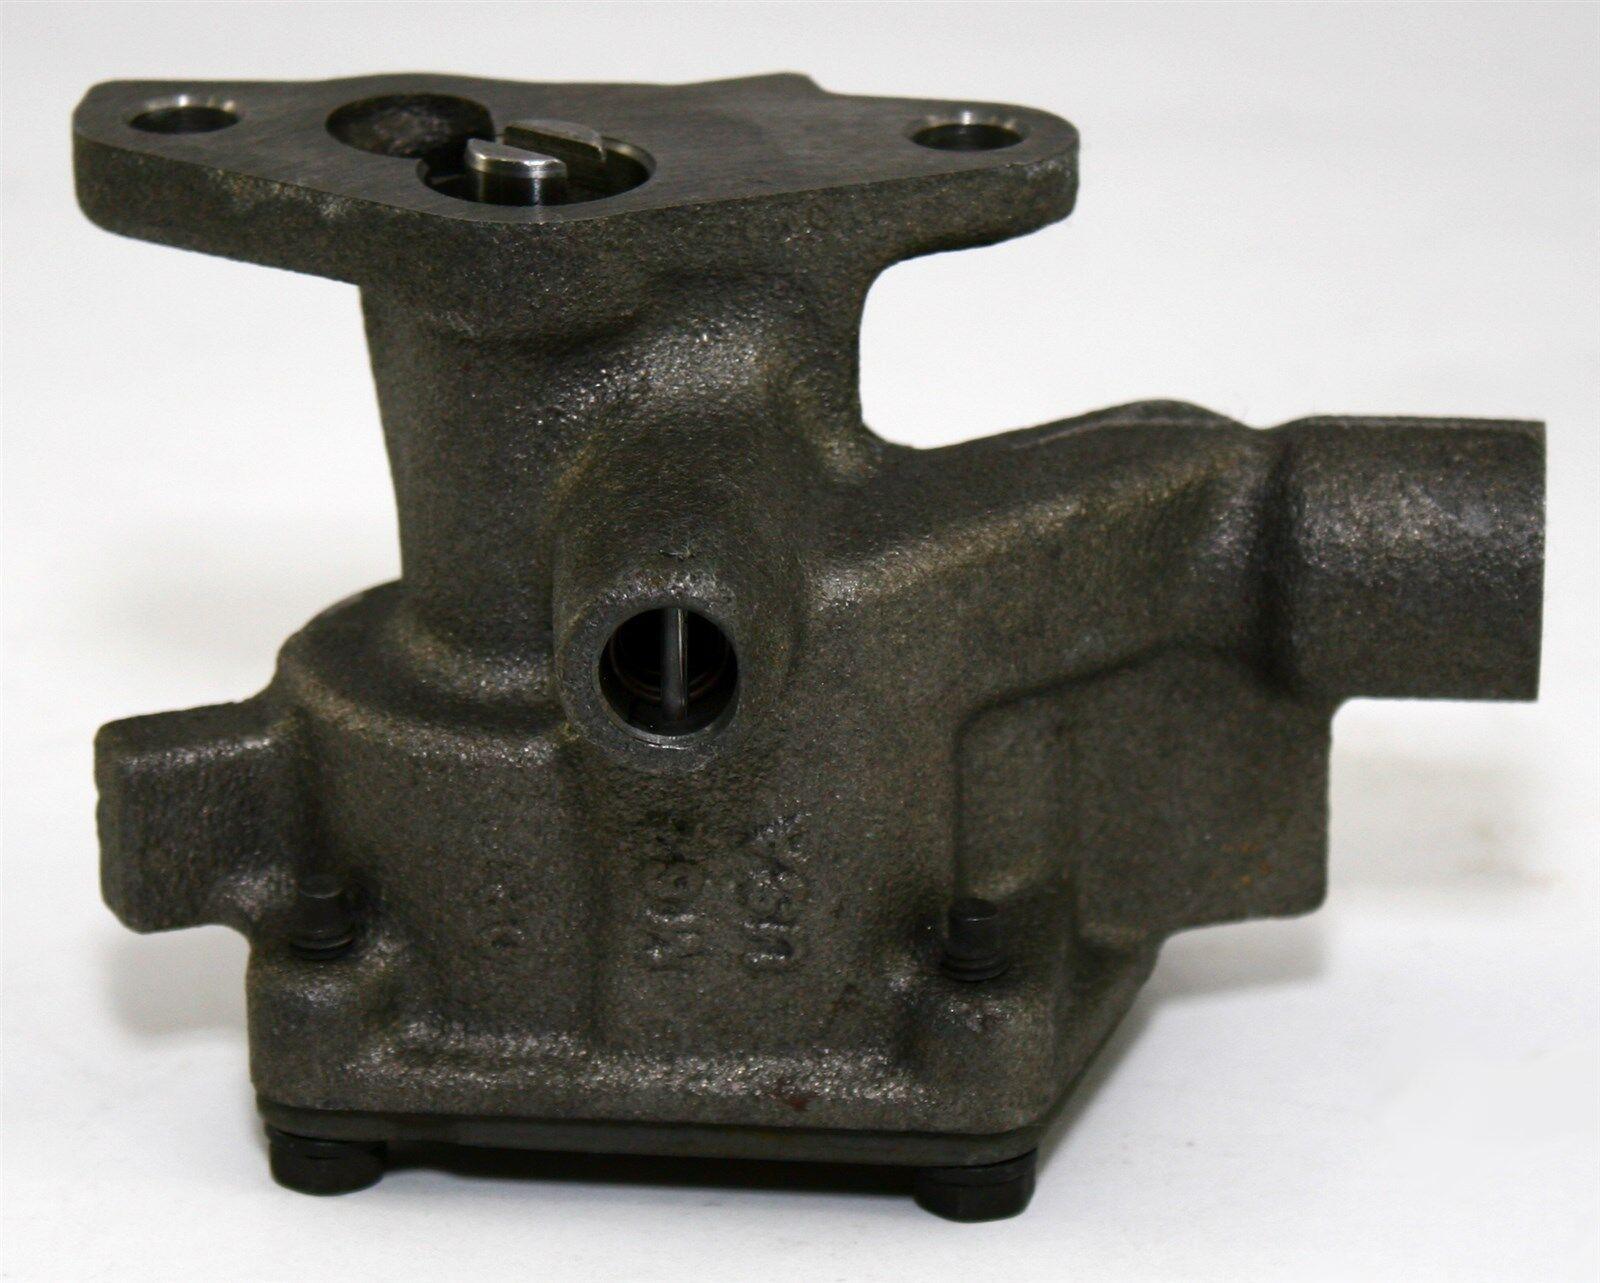 Details about Inline 6 Chevy Melling Oil Pump M62 194 215 230 250 292  Standard Volume/Pressure